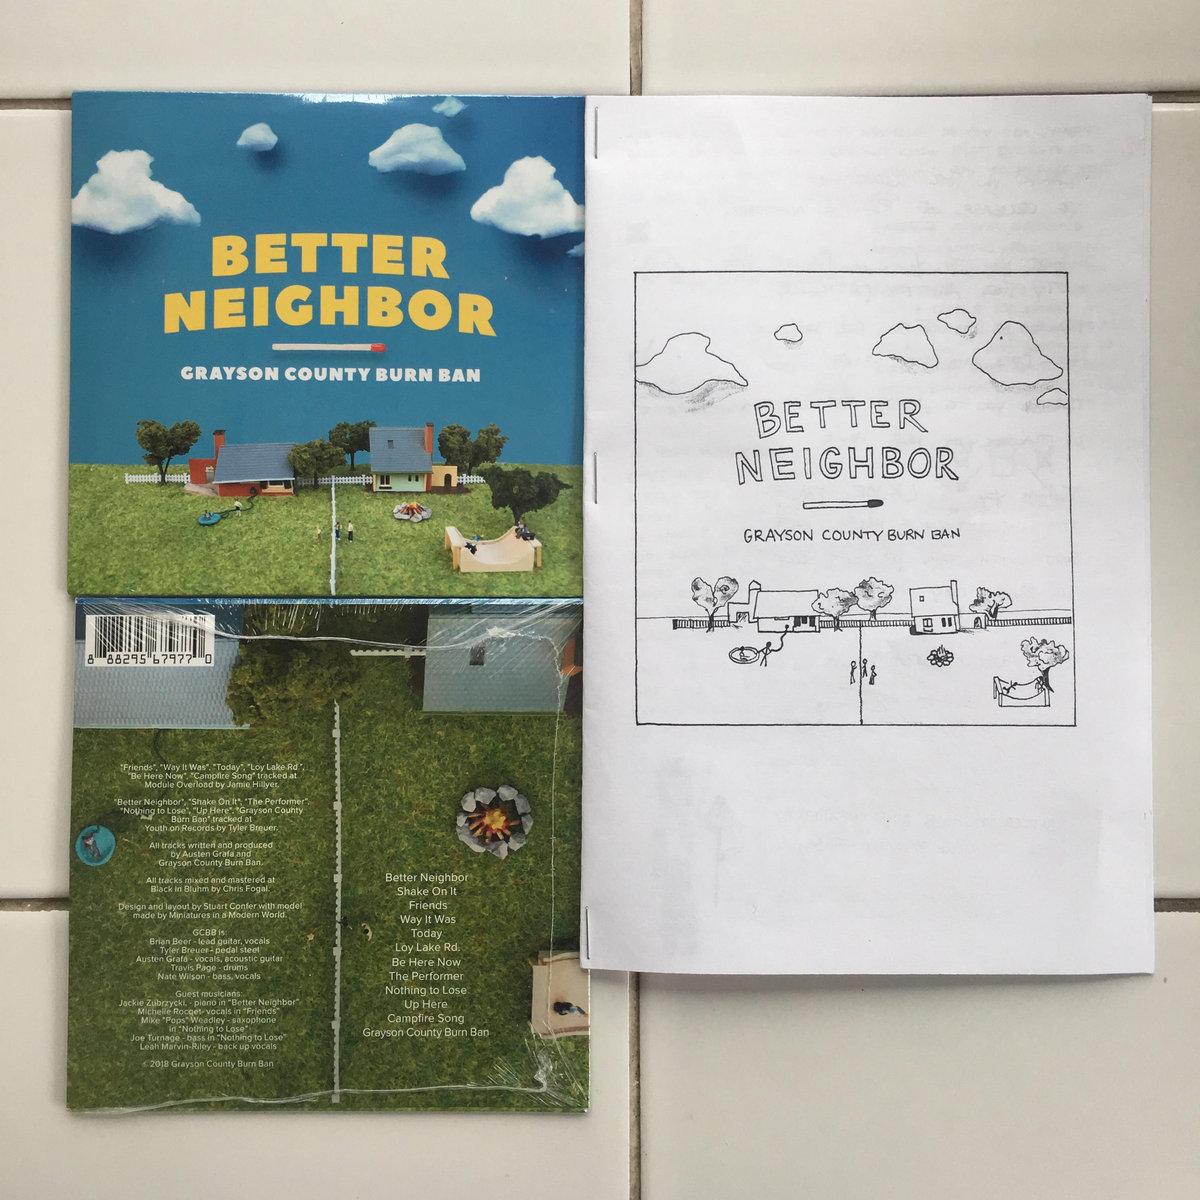 Better Neighbor Grayson County Burn Ban